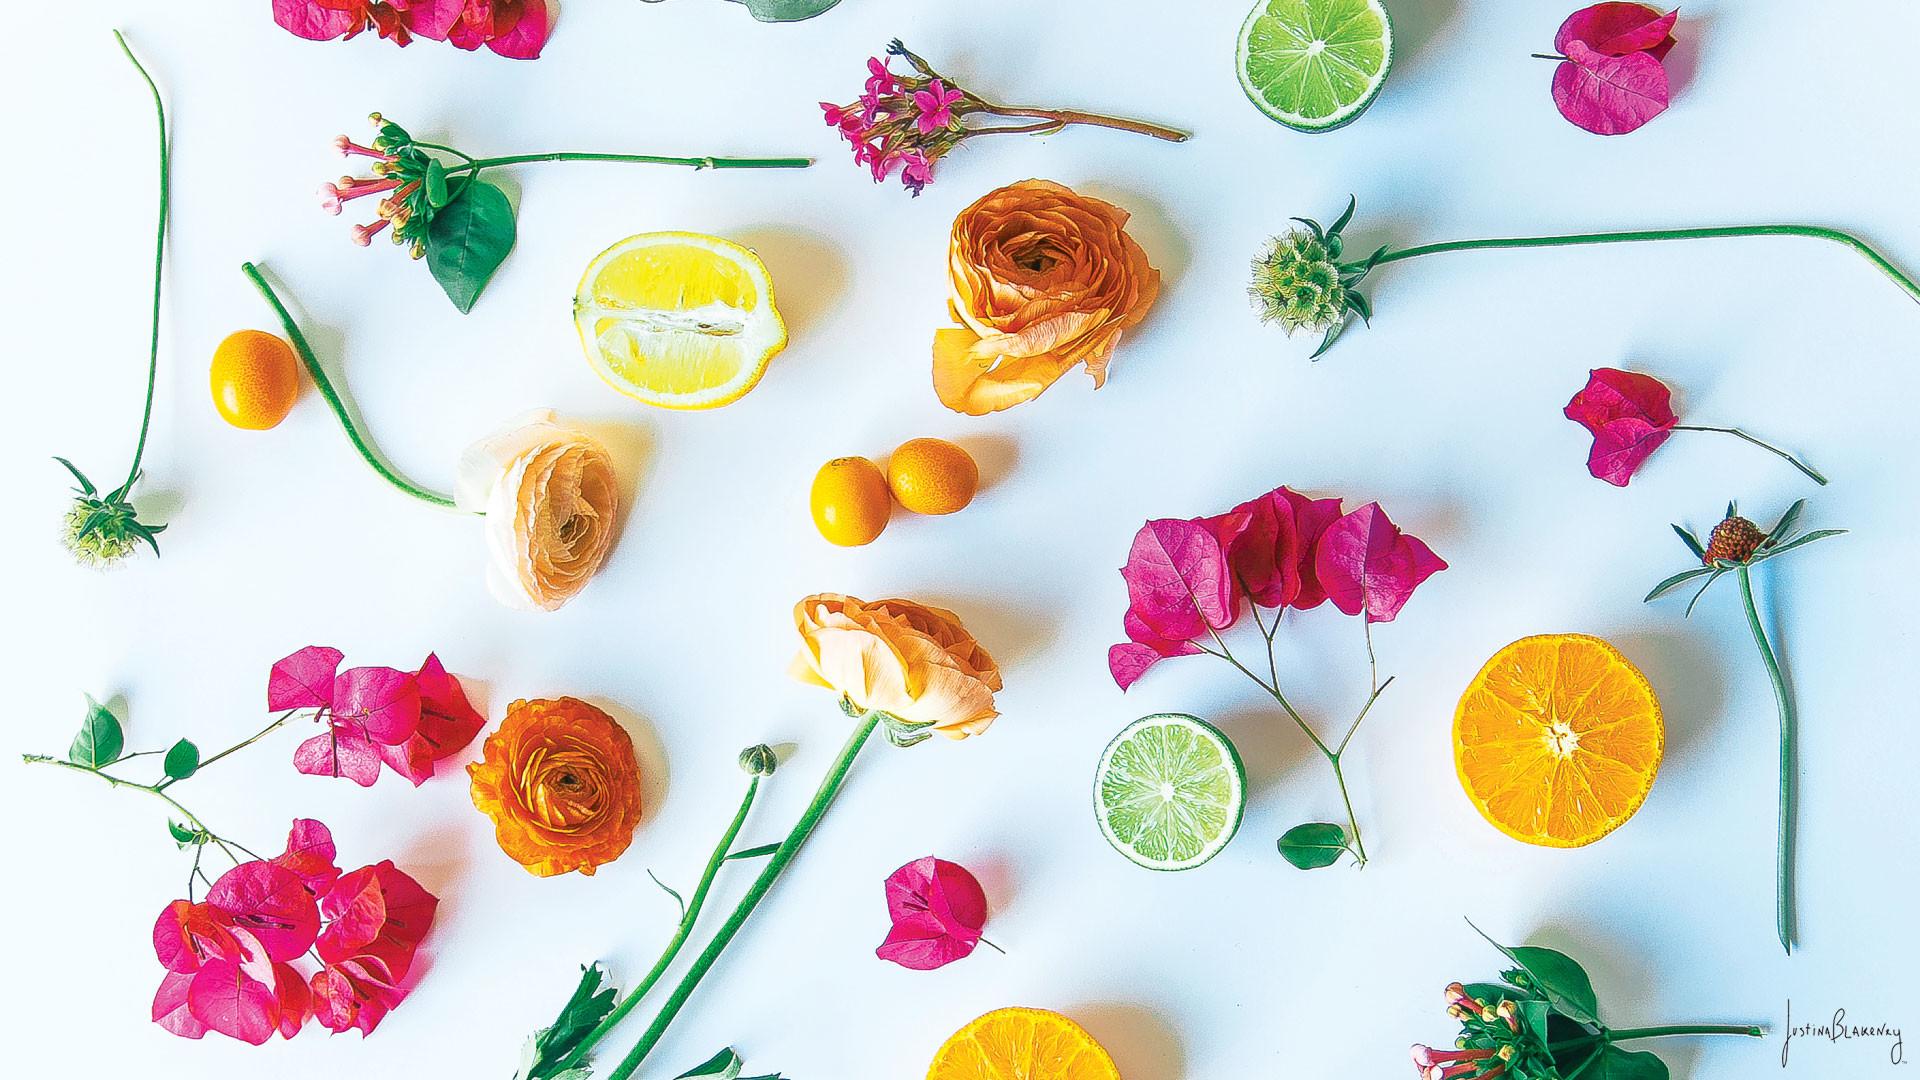 florals. I'm sharing a free spring desktop Wallpaper …